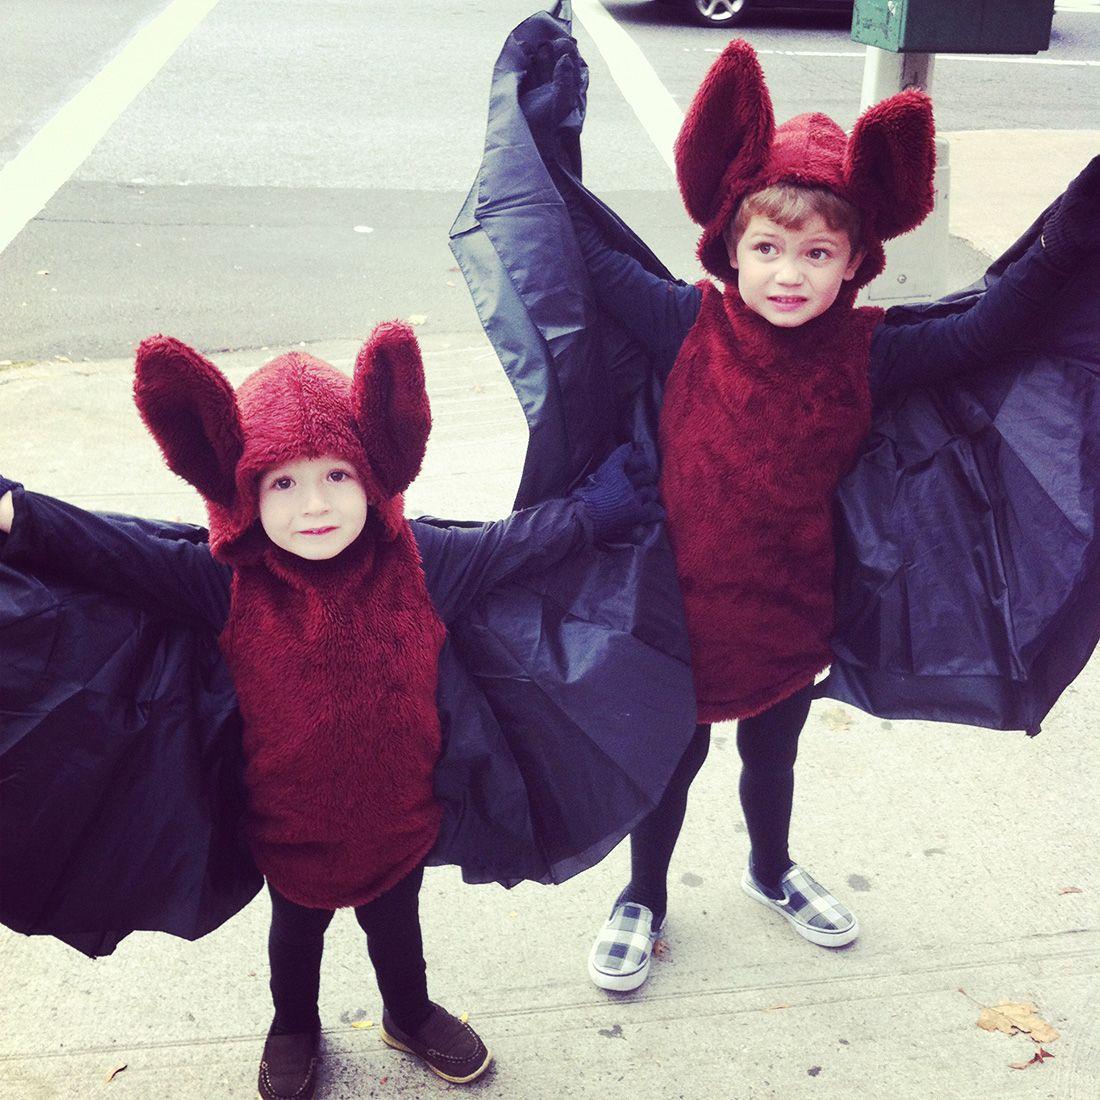 fruit bat costumes by micah heiselt marielle de geest deighan i